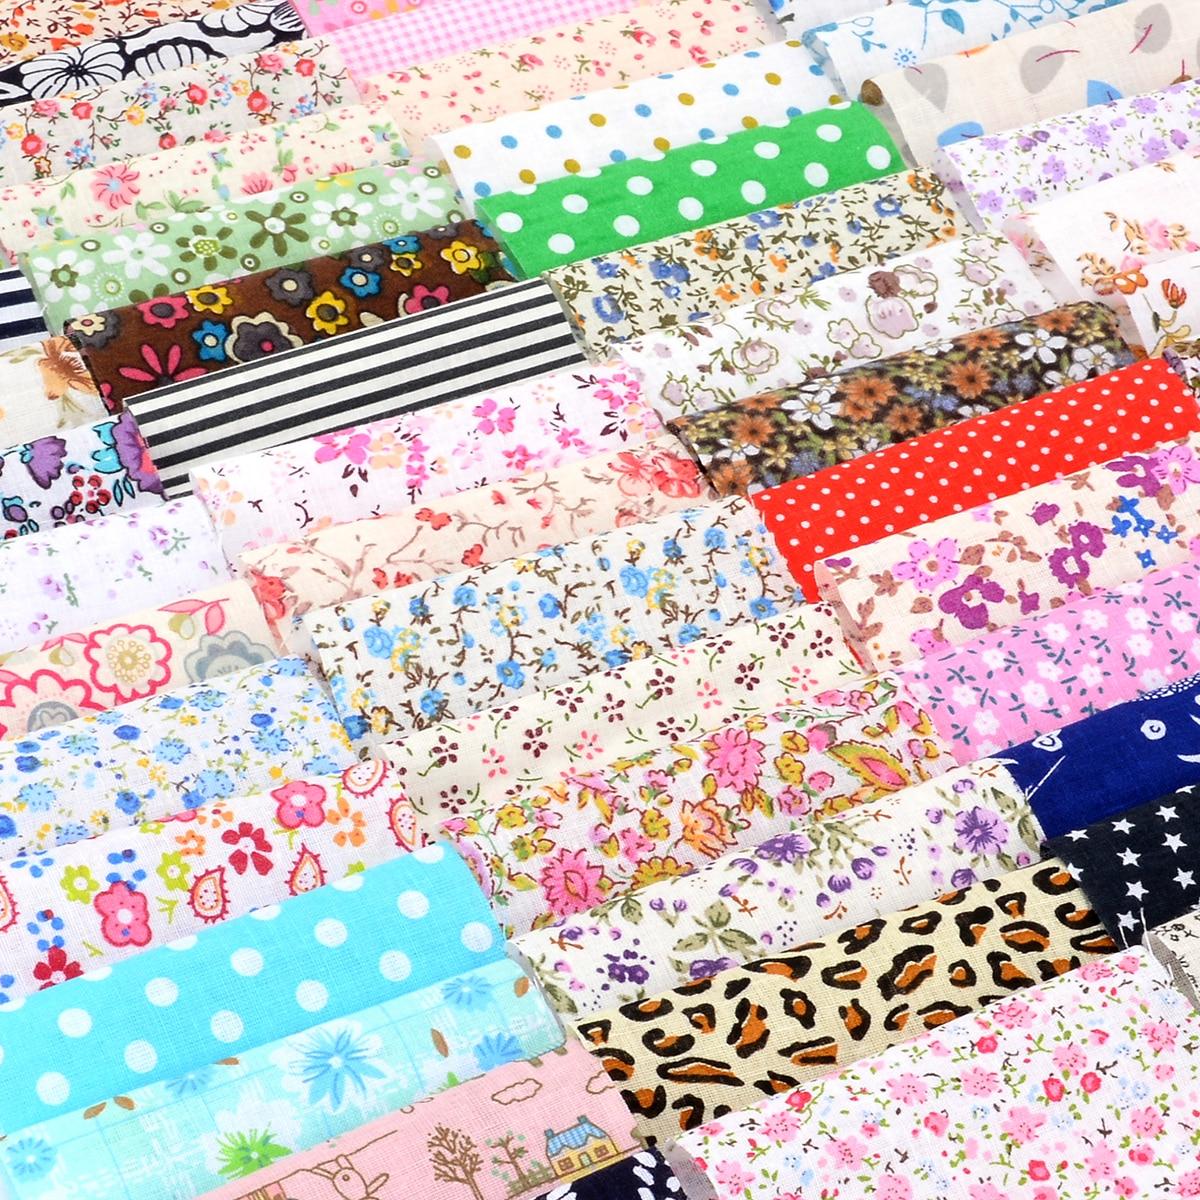 Lote de 60 unids/set de tela de algodón DIY, tela de retales para coser, acolchar, tejidos, ropa de cama de costura, textil 10x10cm